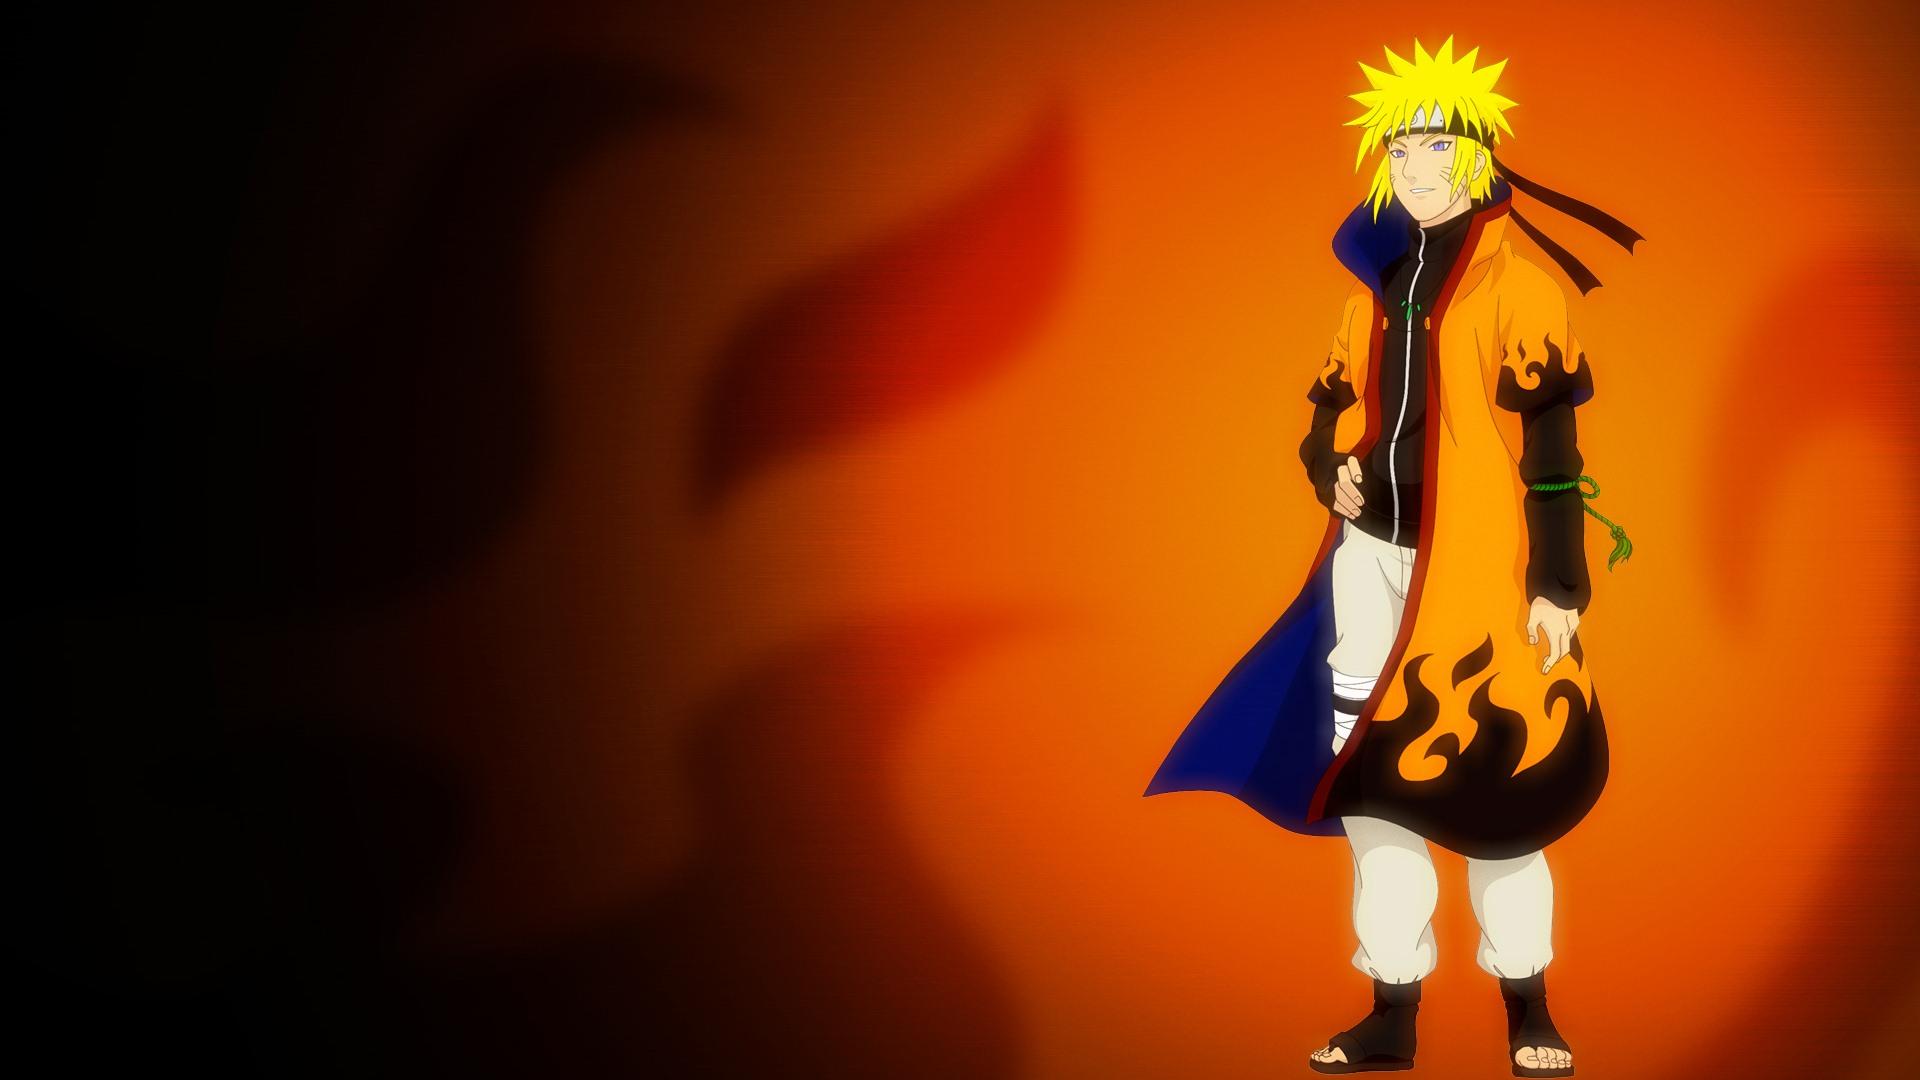 Naruto wallpapers for desktop 1920x1080 wallpapersafari - Anime backgrounds hd 1920x1080 ...